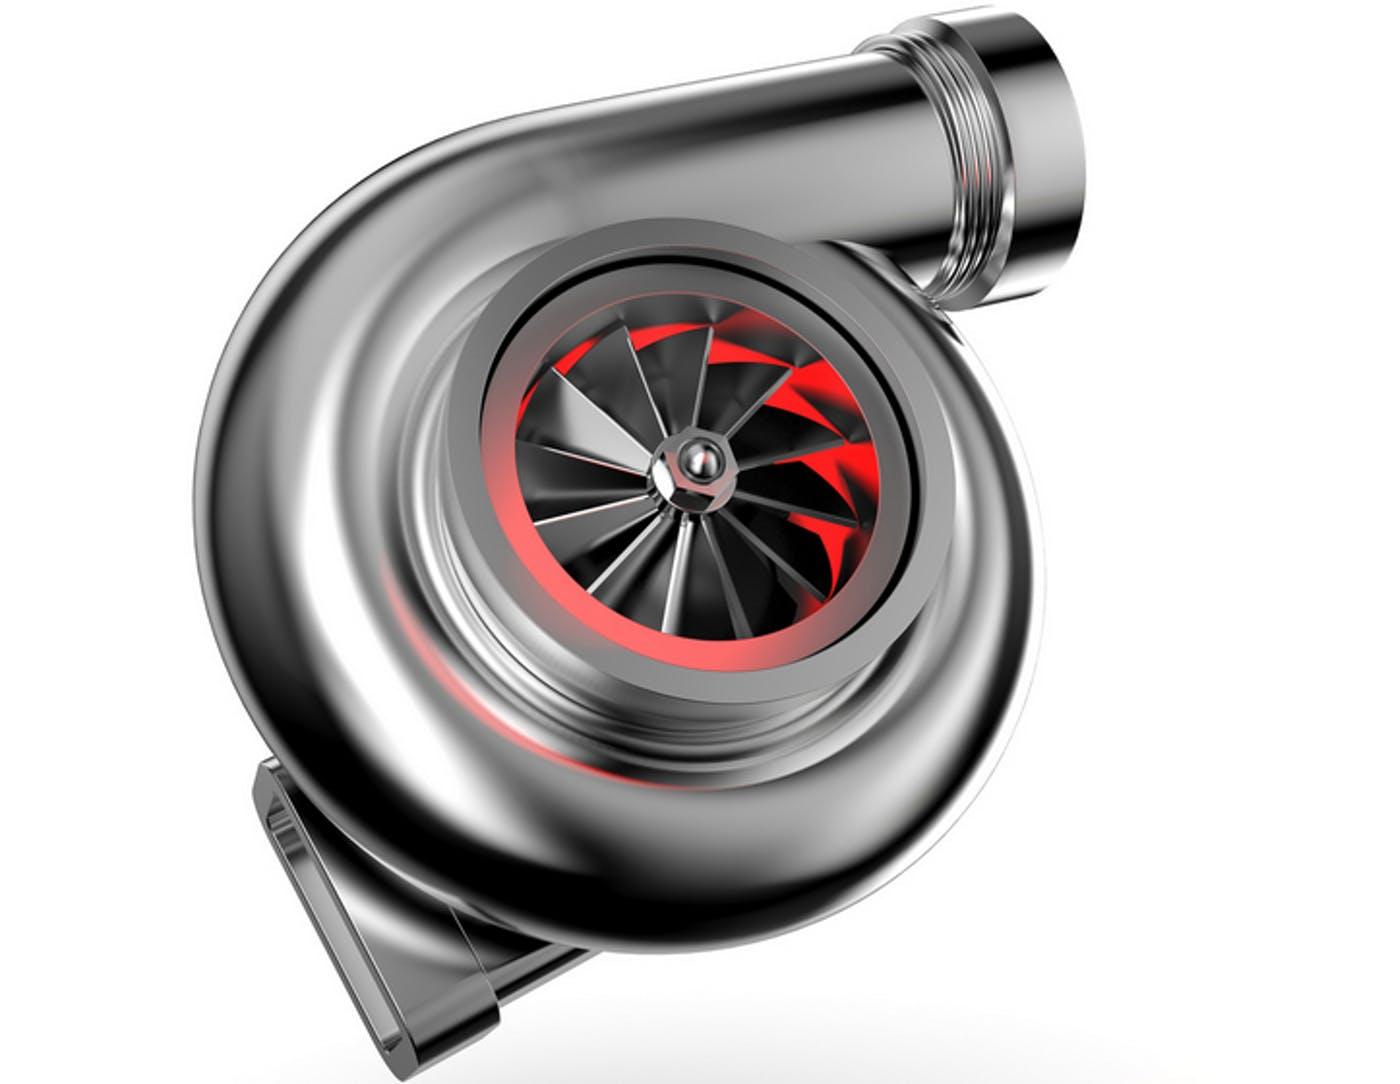 hight resolution of turbo jpeg